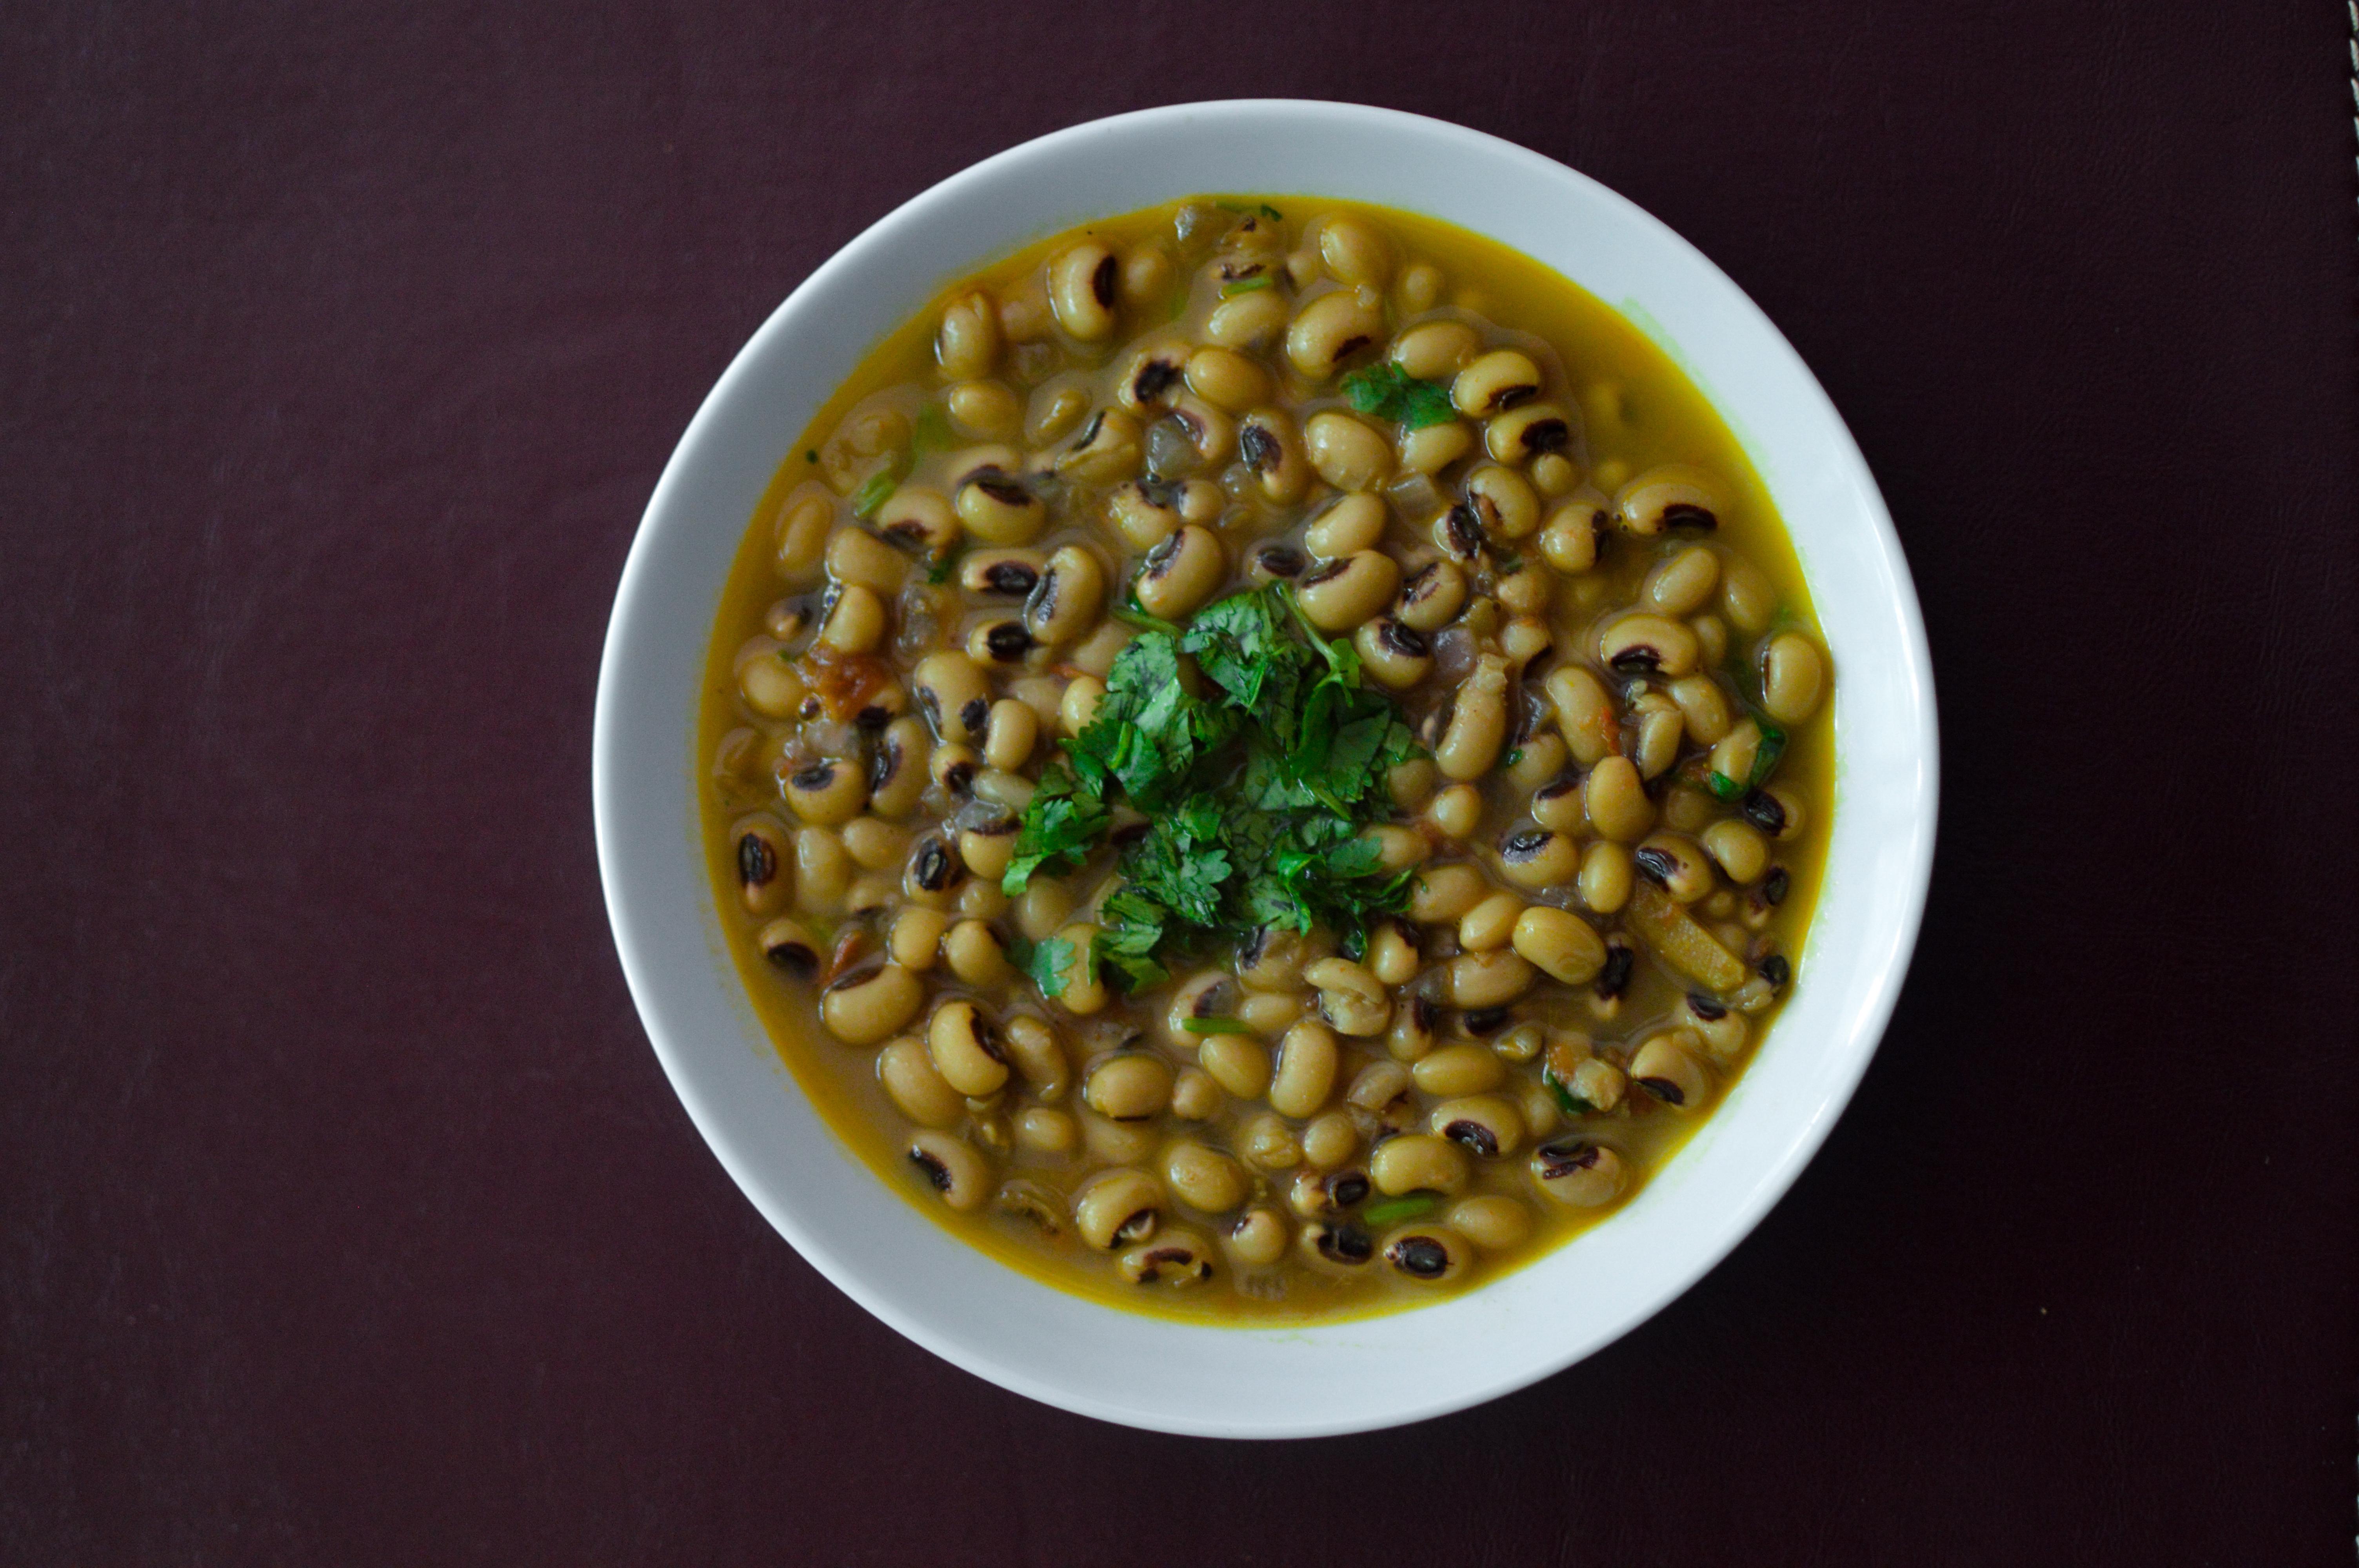 October: Cooking With Garam Masala